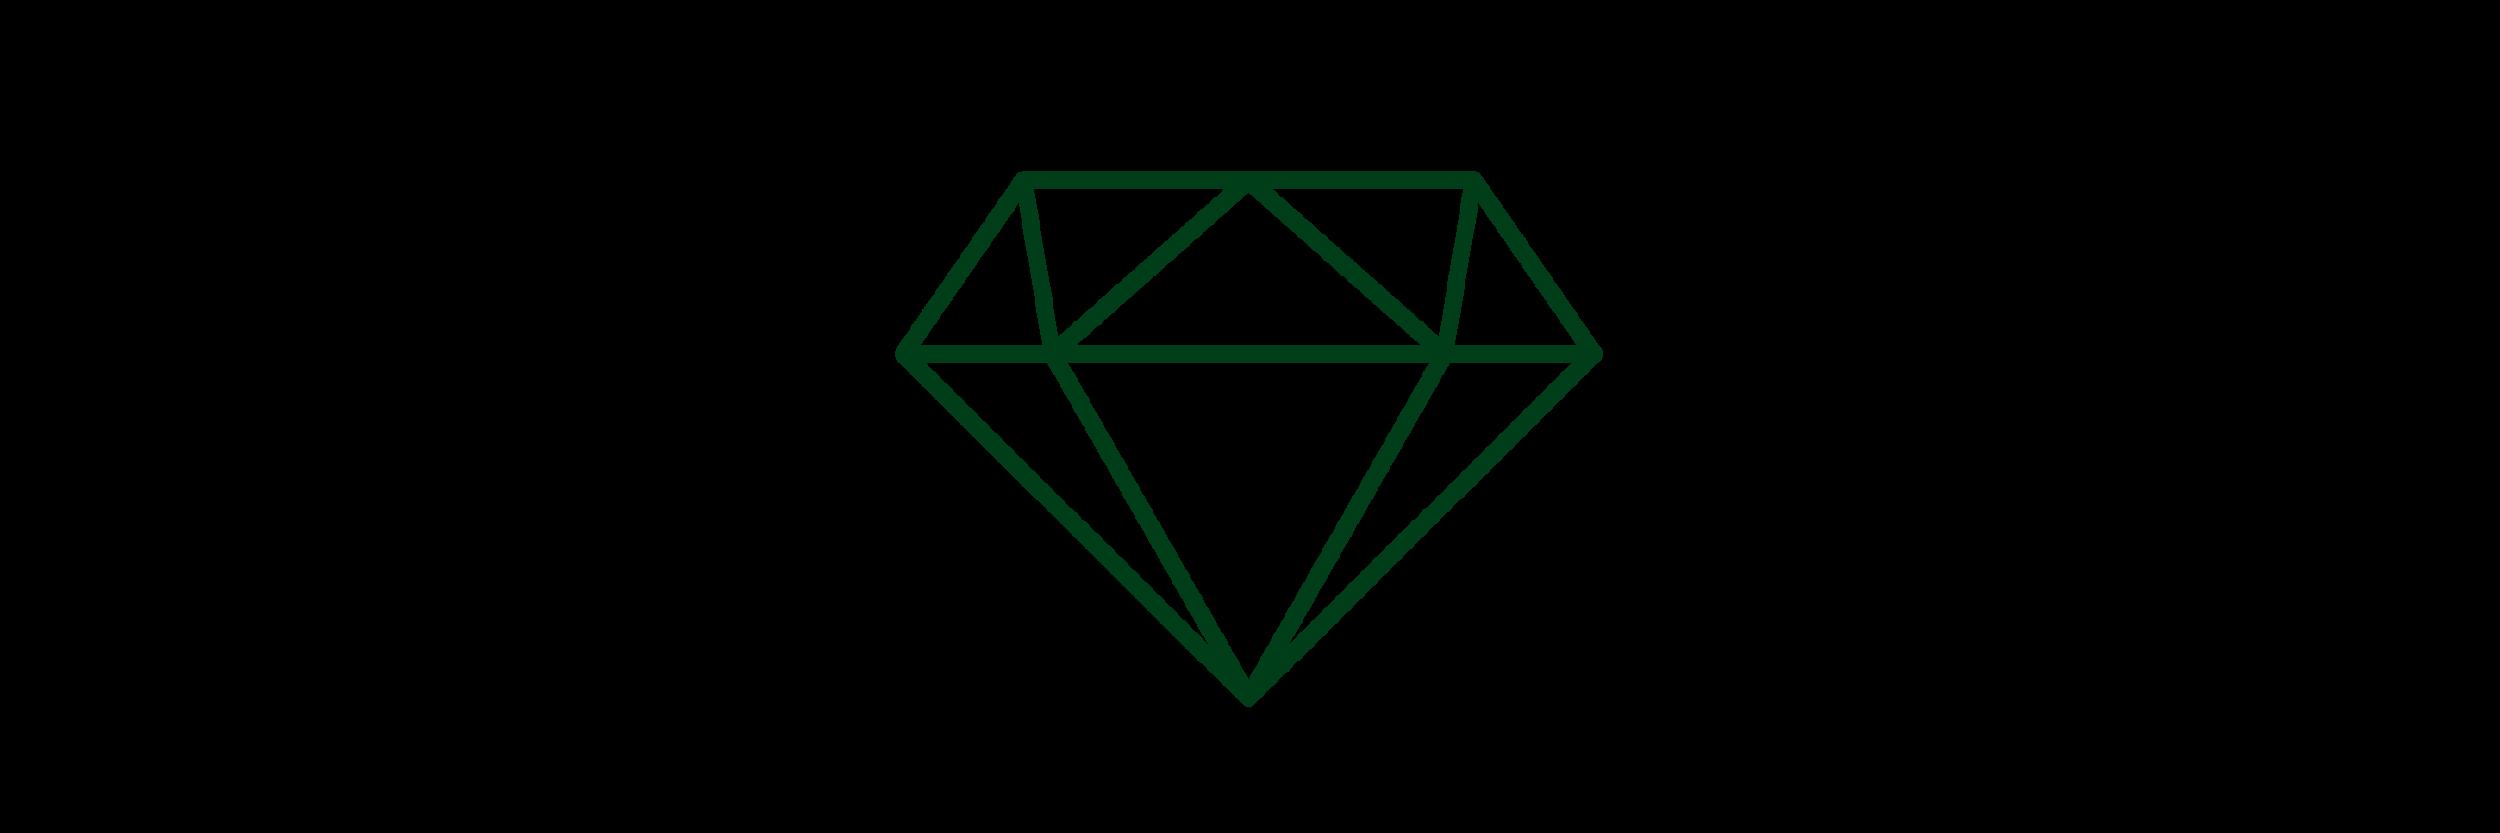 diamond-icon.png